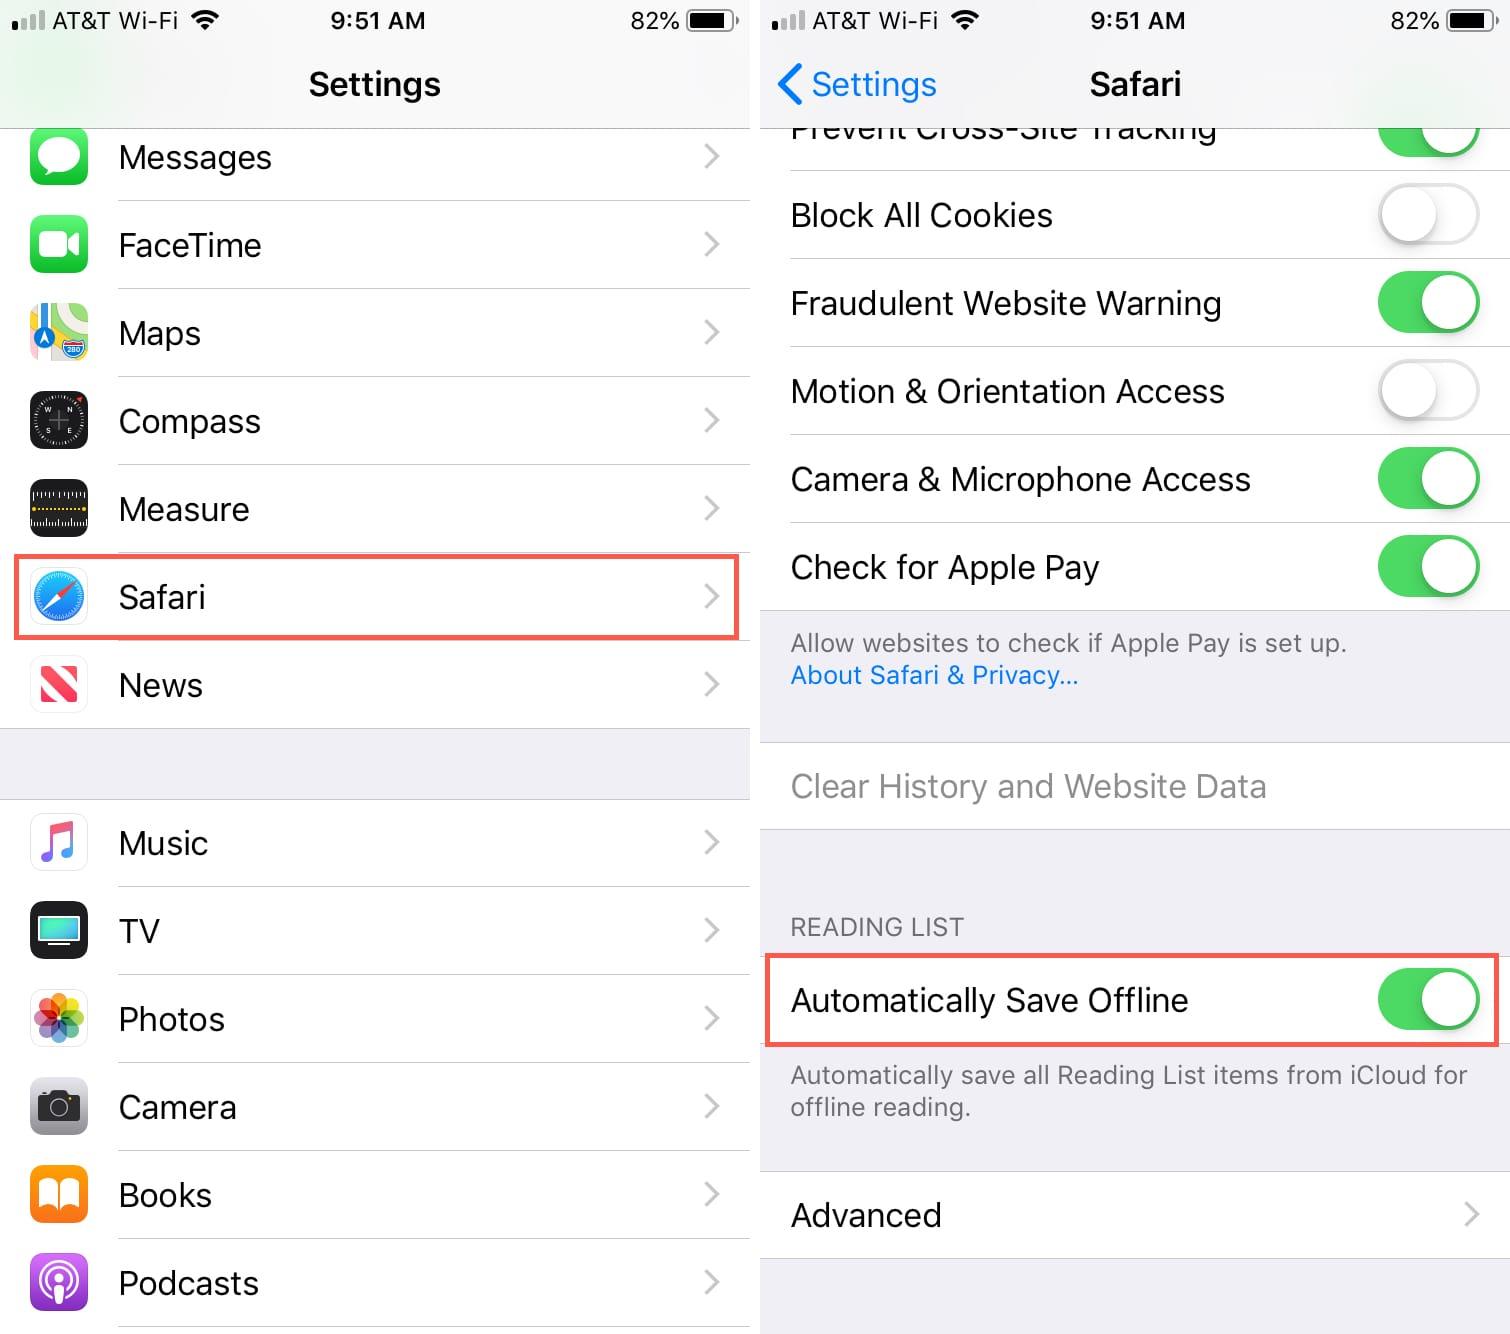 Habilitar lista de lectura de Safari fuera de línea iPhone